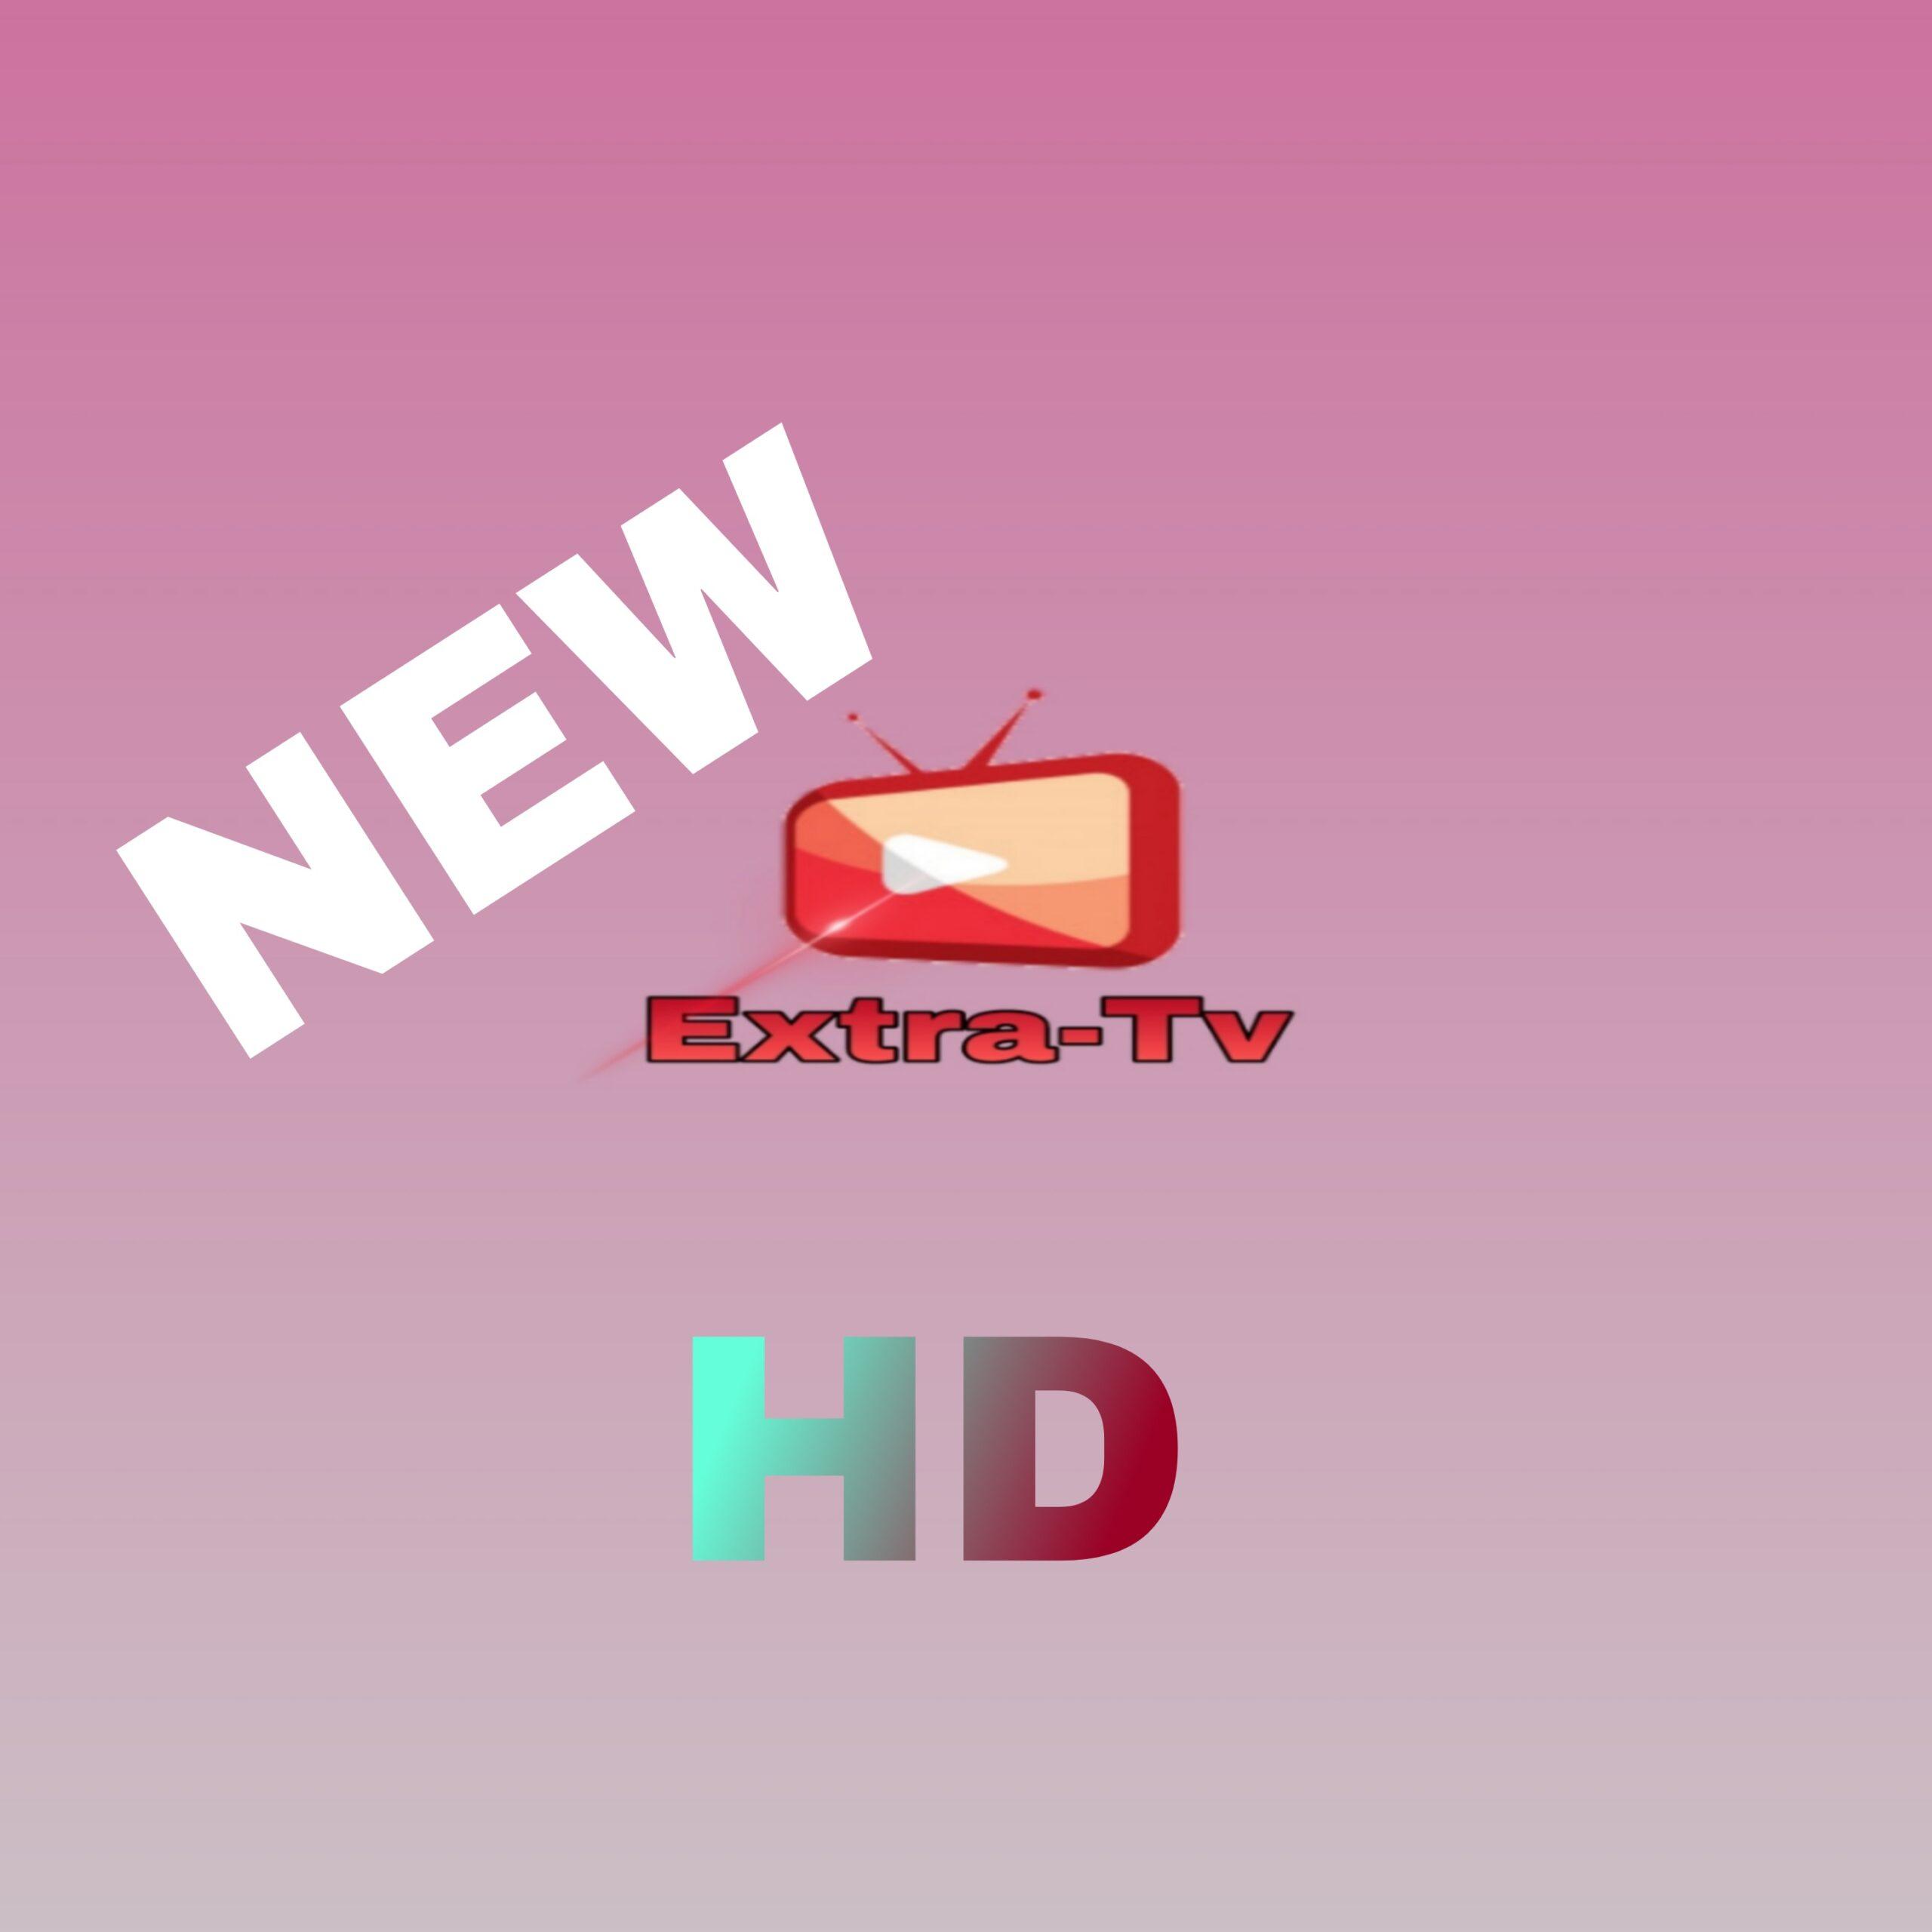 Extra pro Tv Apk 2020 [new October] 1